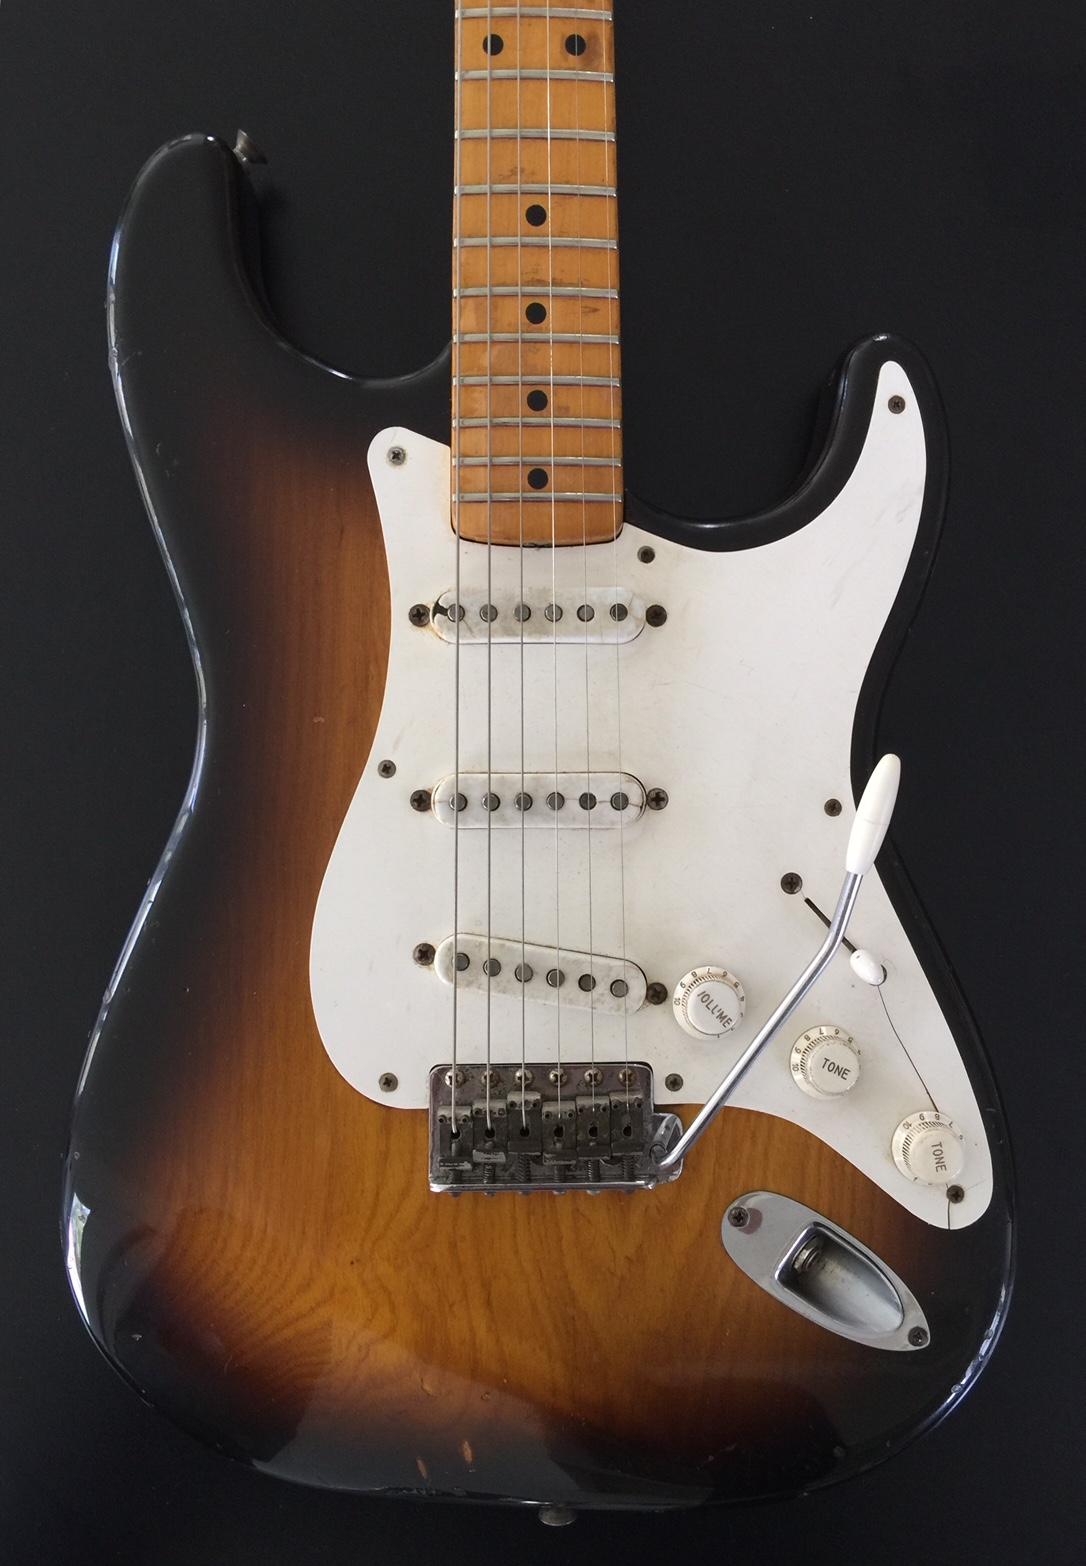 1954 Fender Stratocaster Sunburst SN# 0241 W/ Original case